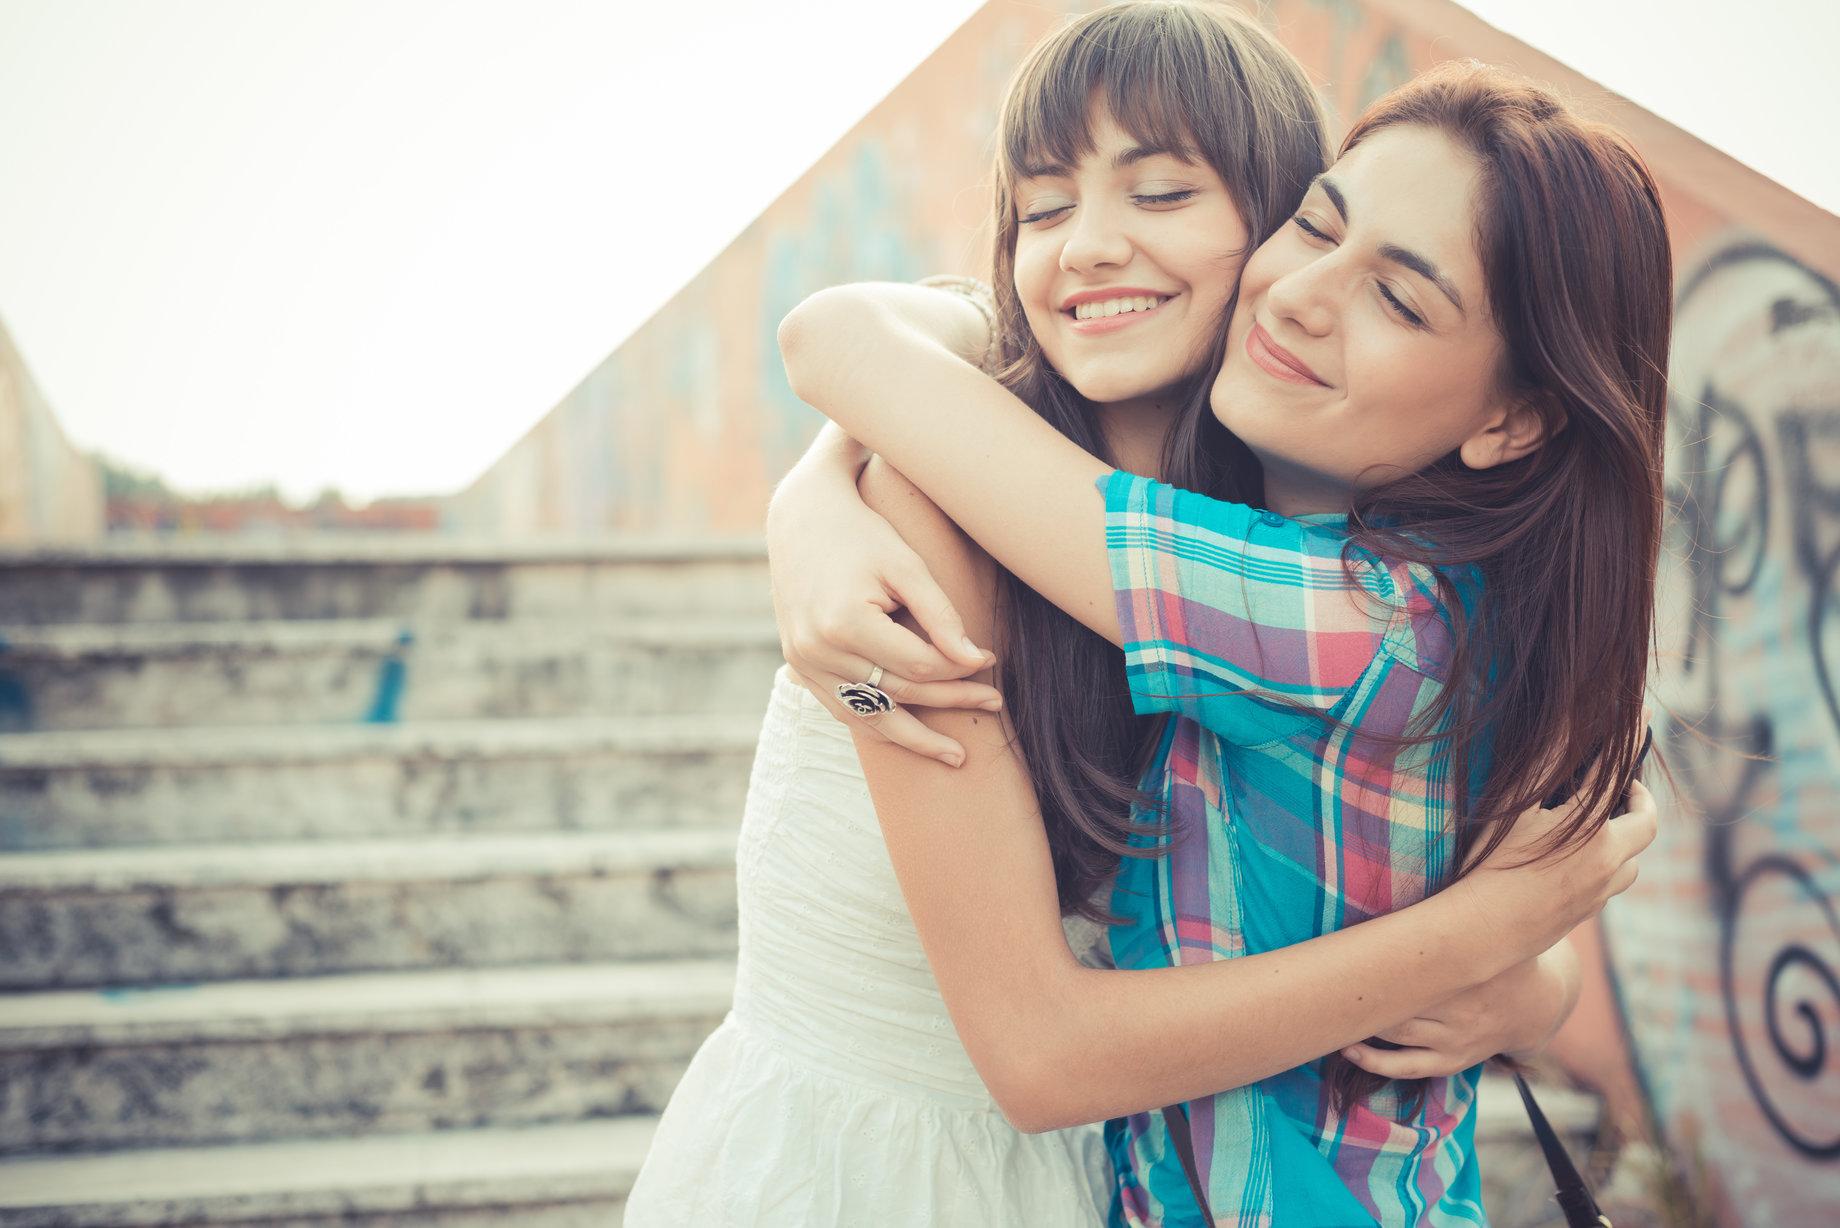 benefits of friendliness